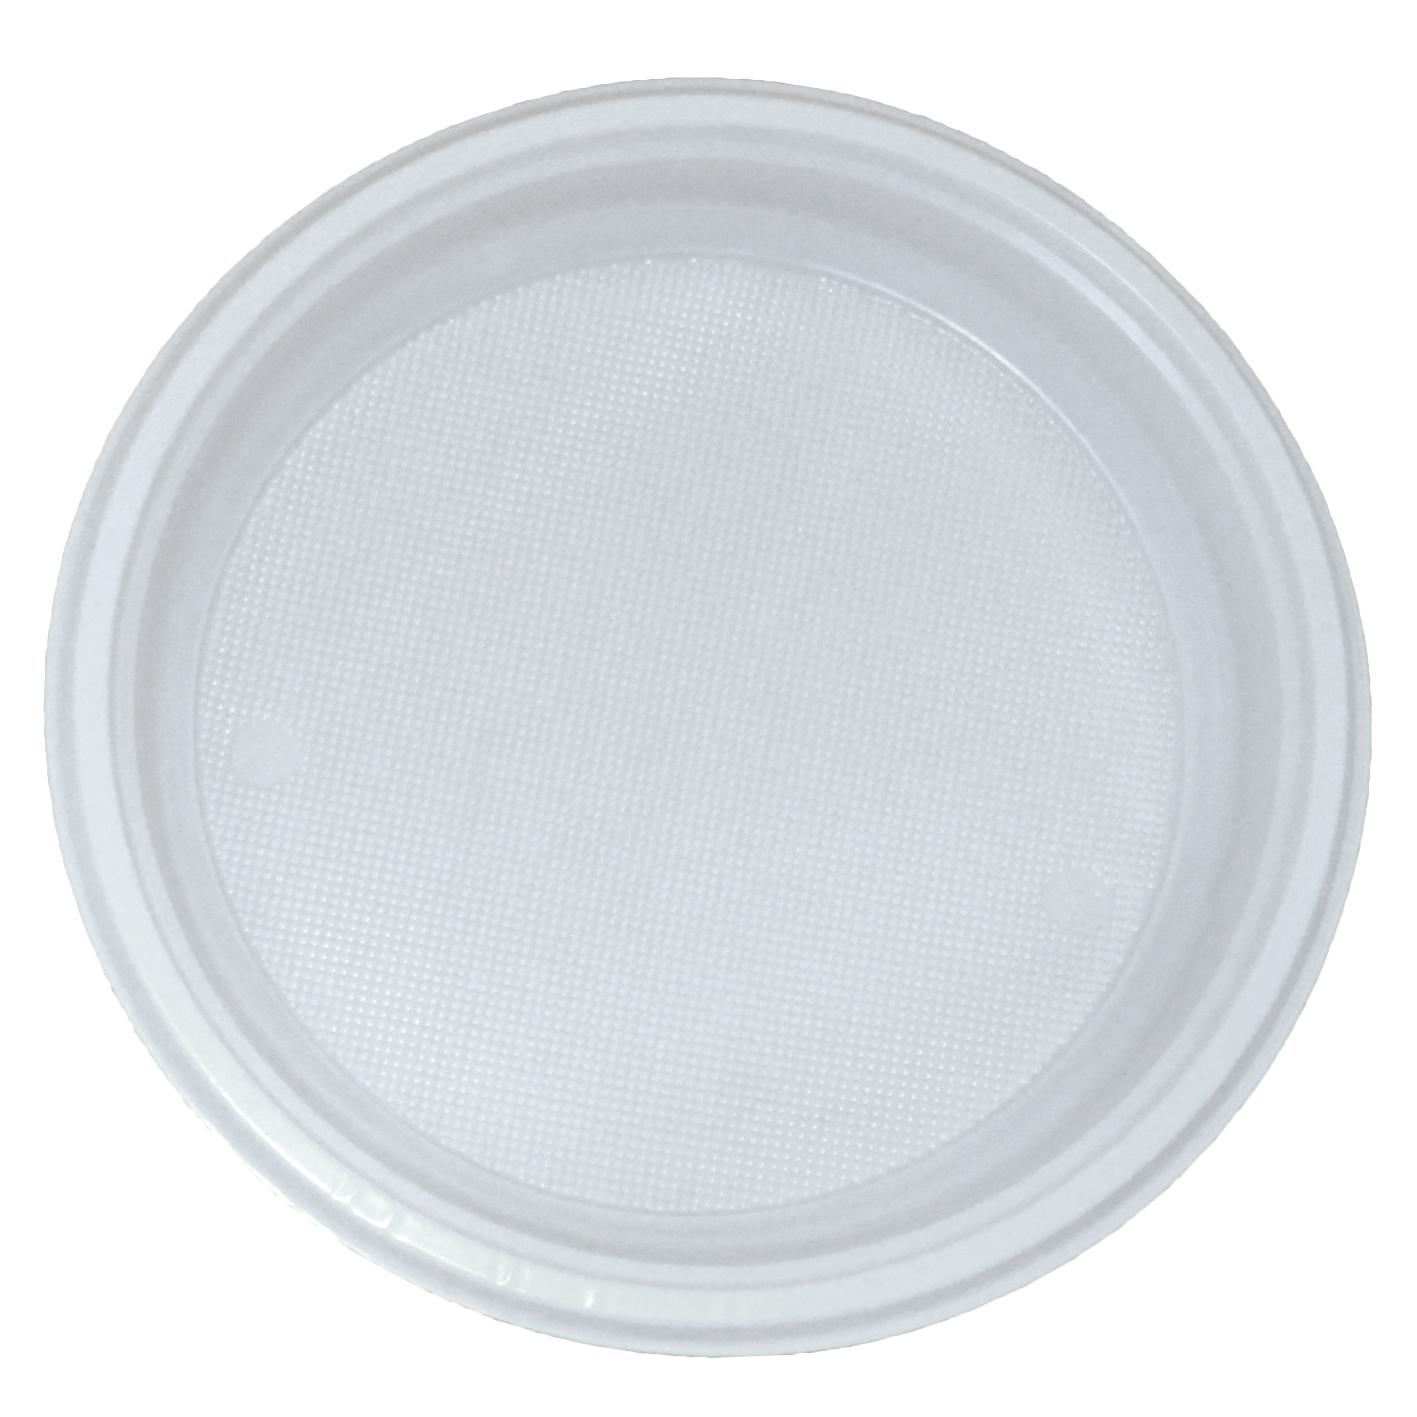 Farfurii De Unica Folosinta 22 Polipropilena (PP) Turcia 50 Buc/Set sanito.ro